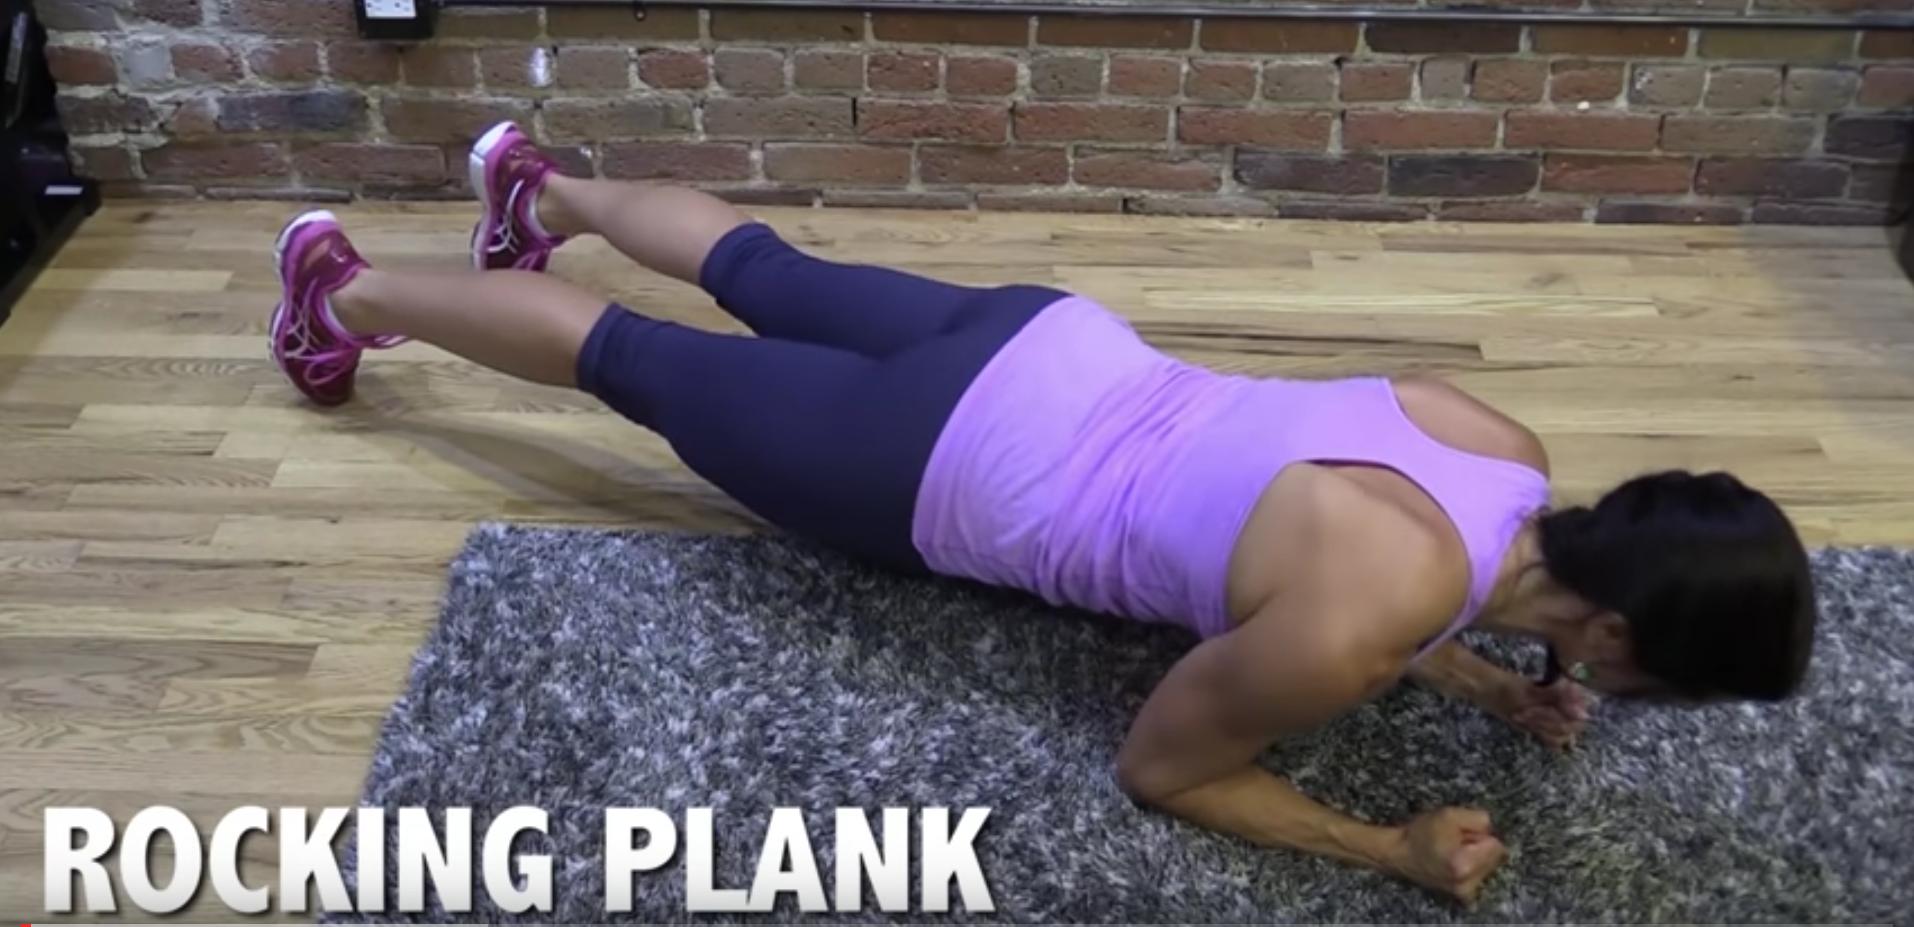 Rocking Plank